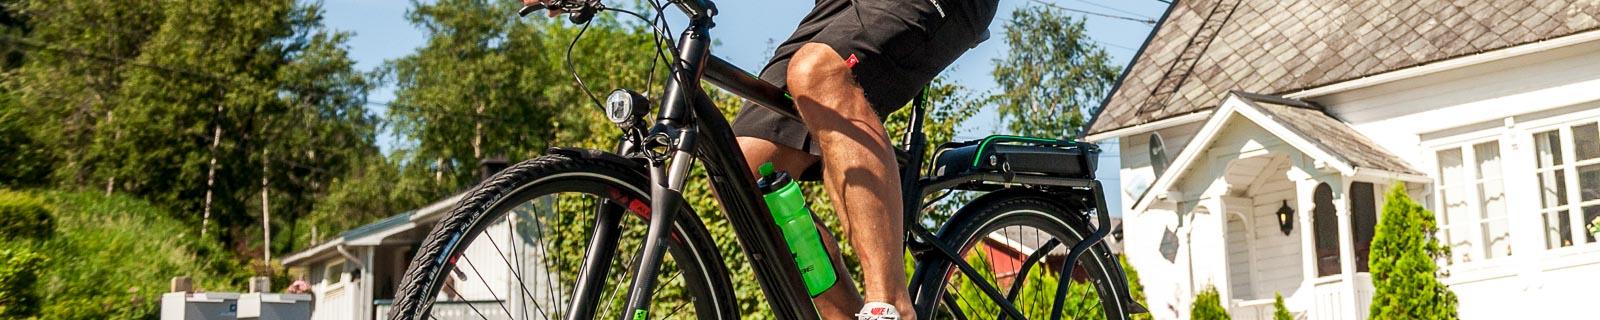 Trekking E-Bike per Uomini